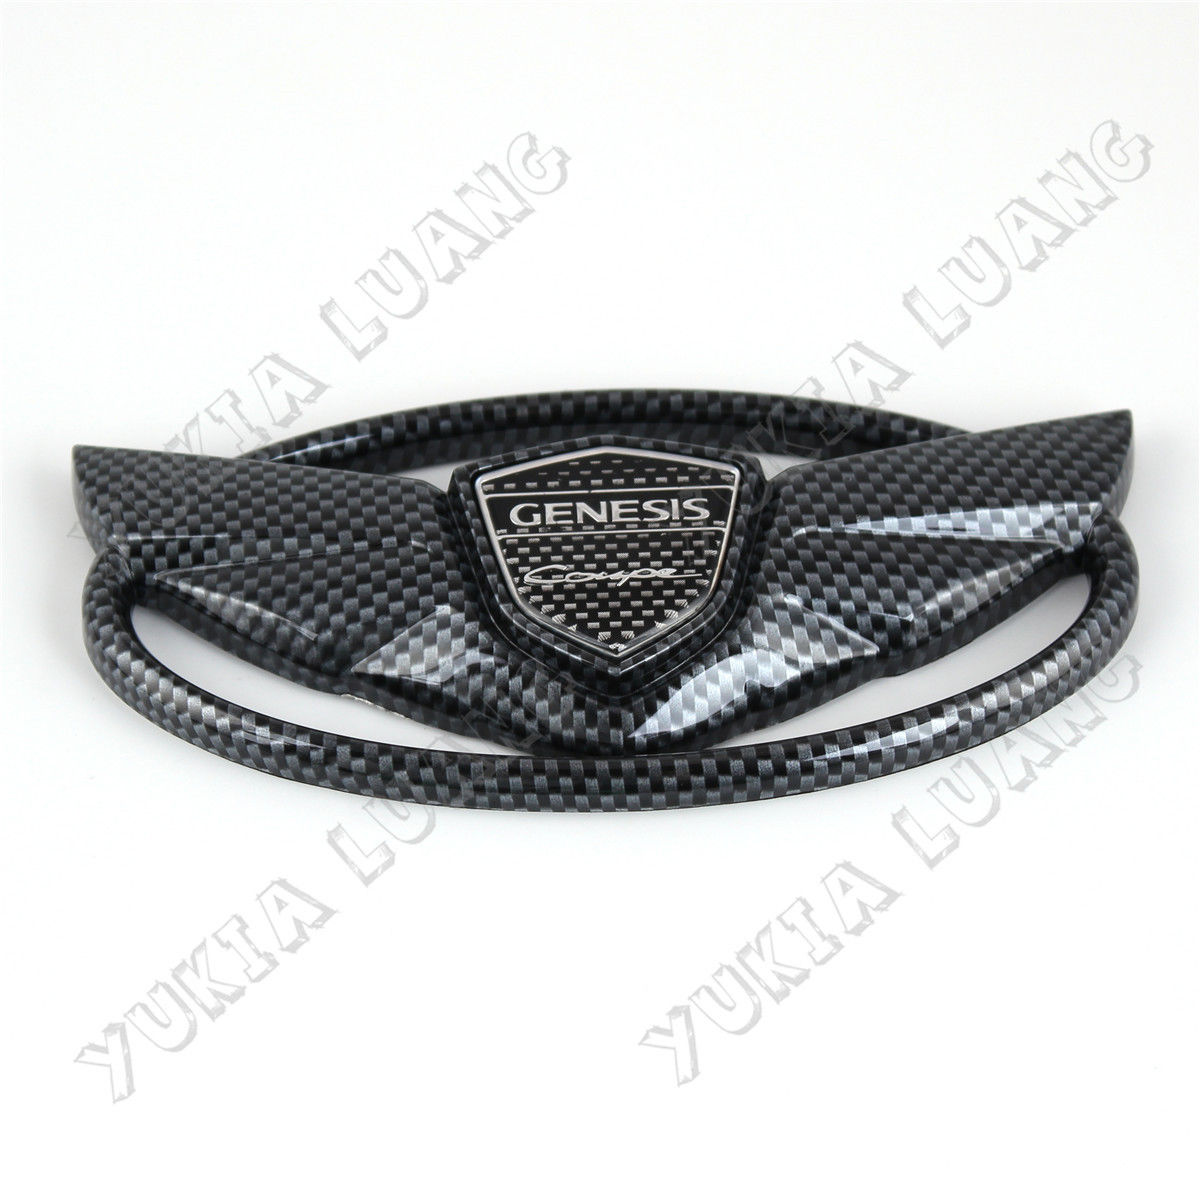 GENESIS COUPE 2010-15 Car Front Grille Emblem Carbon Fiber Styling Wing